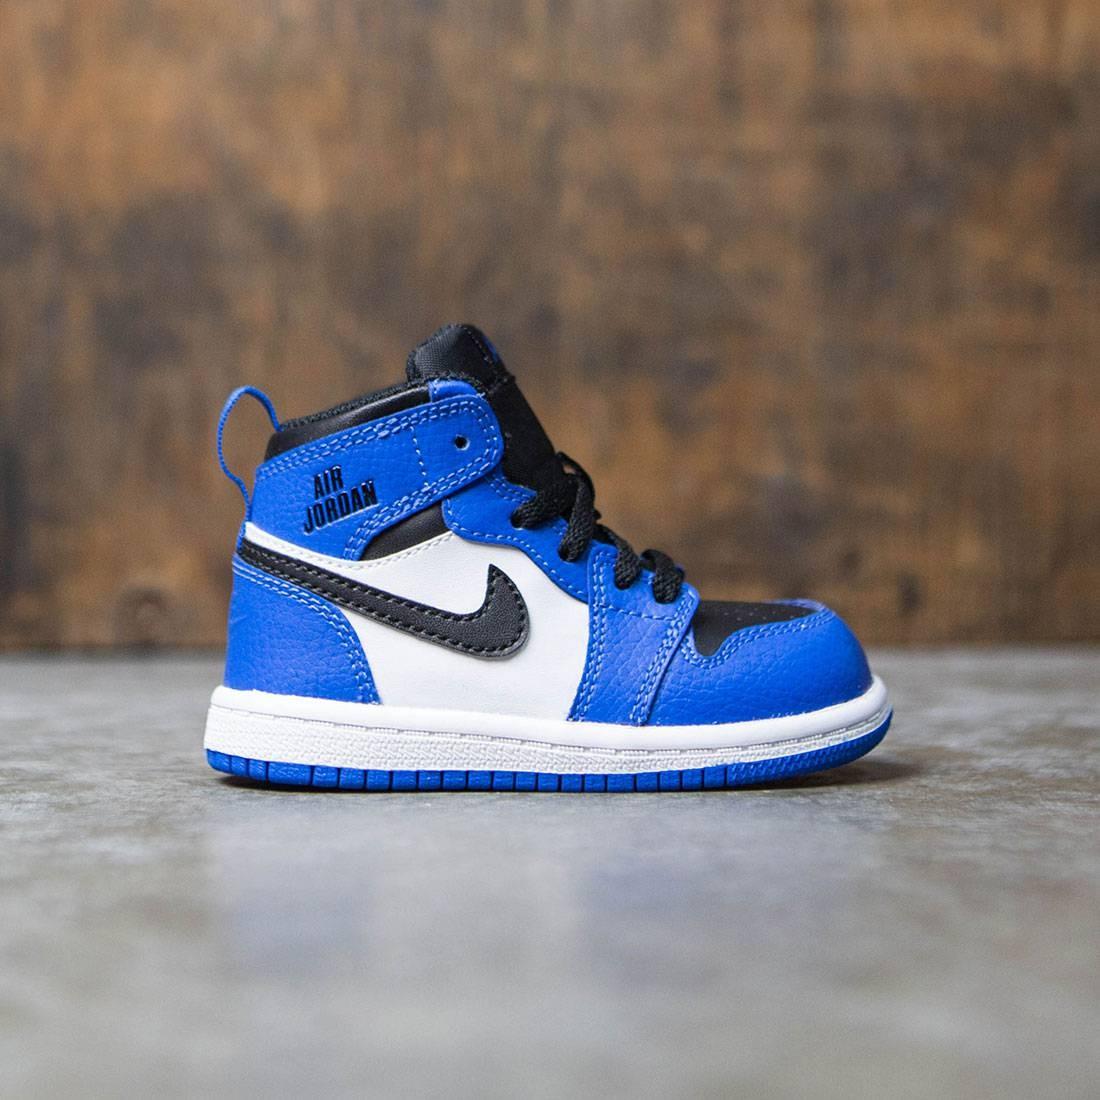 0feac2891806 Men s Air Jordan Impact Training Shoes Toddler Swim Shoes